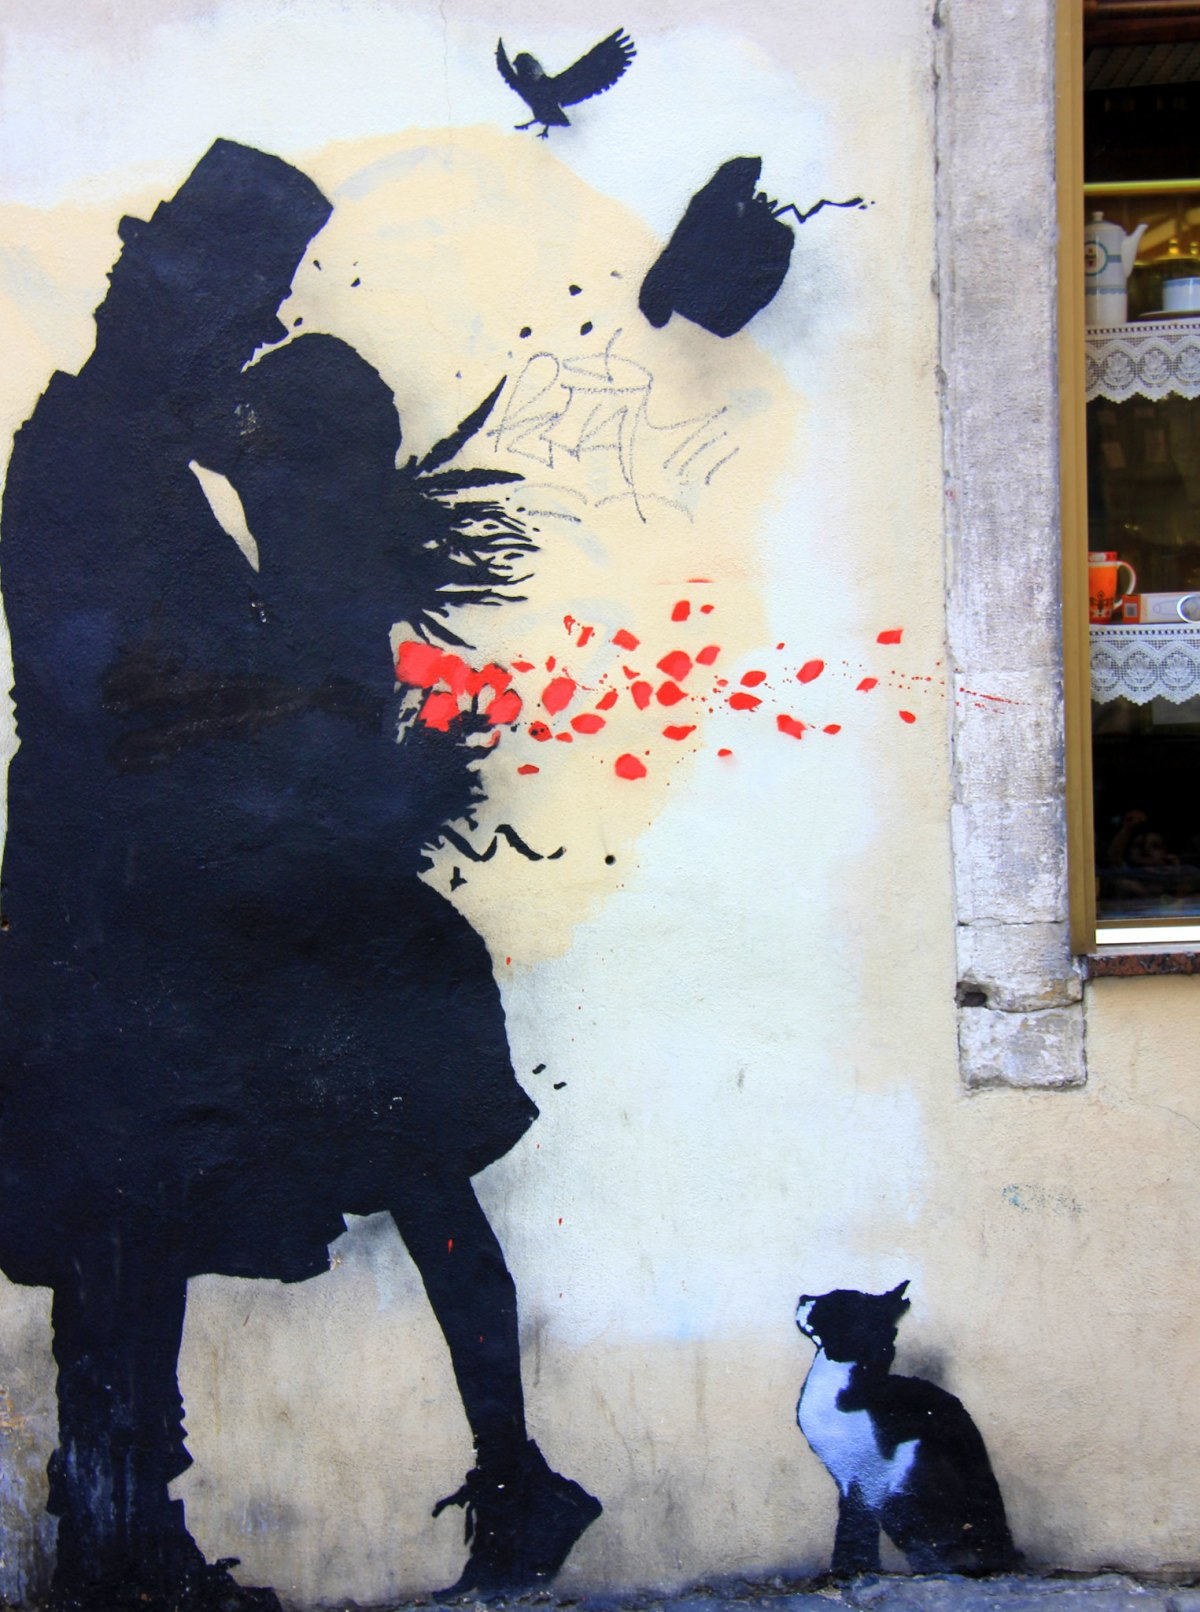 Street art in Padua is beautiful